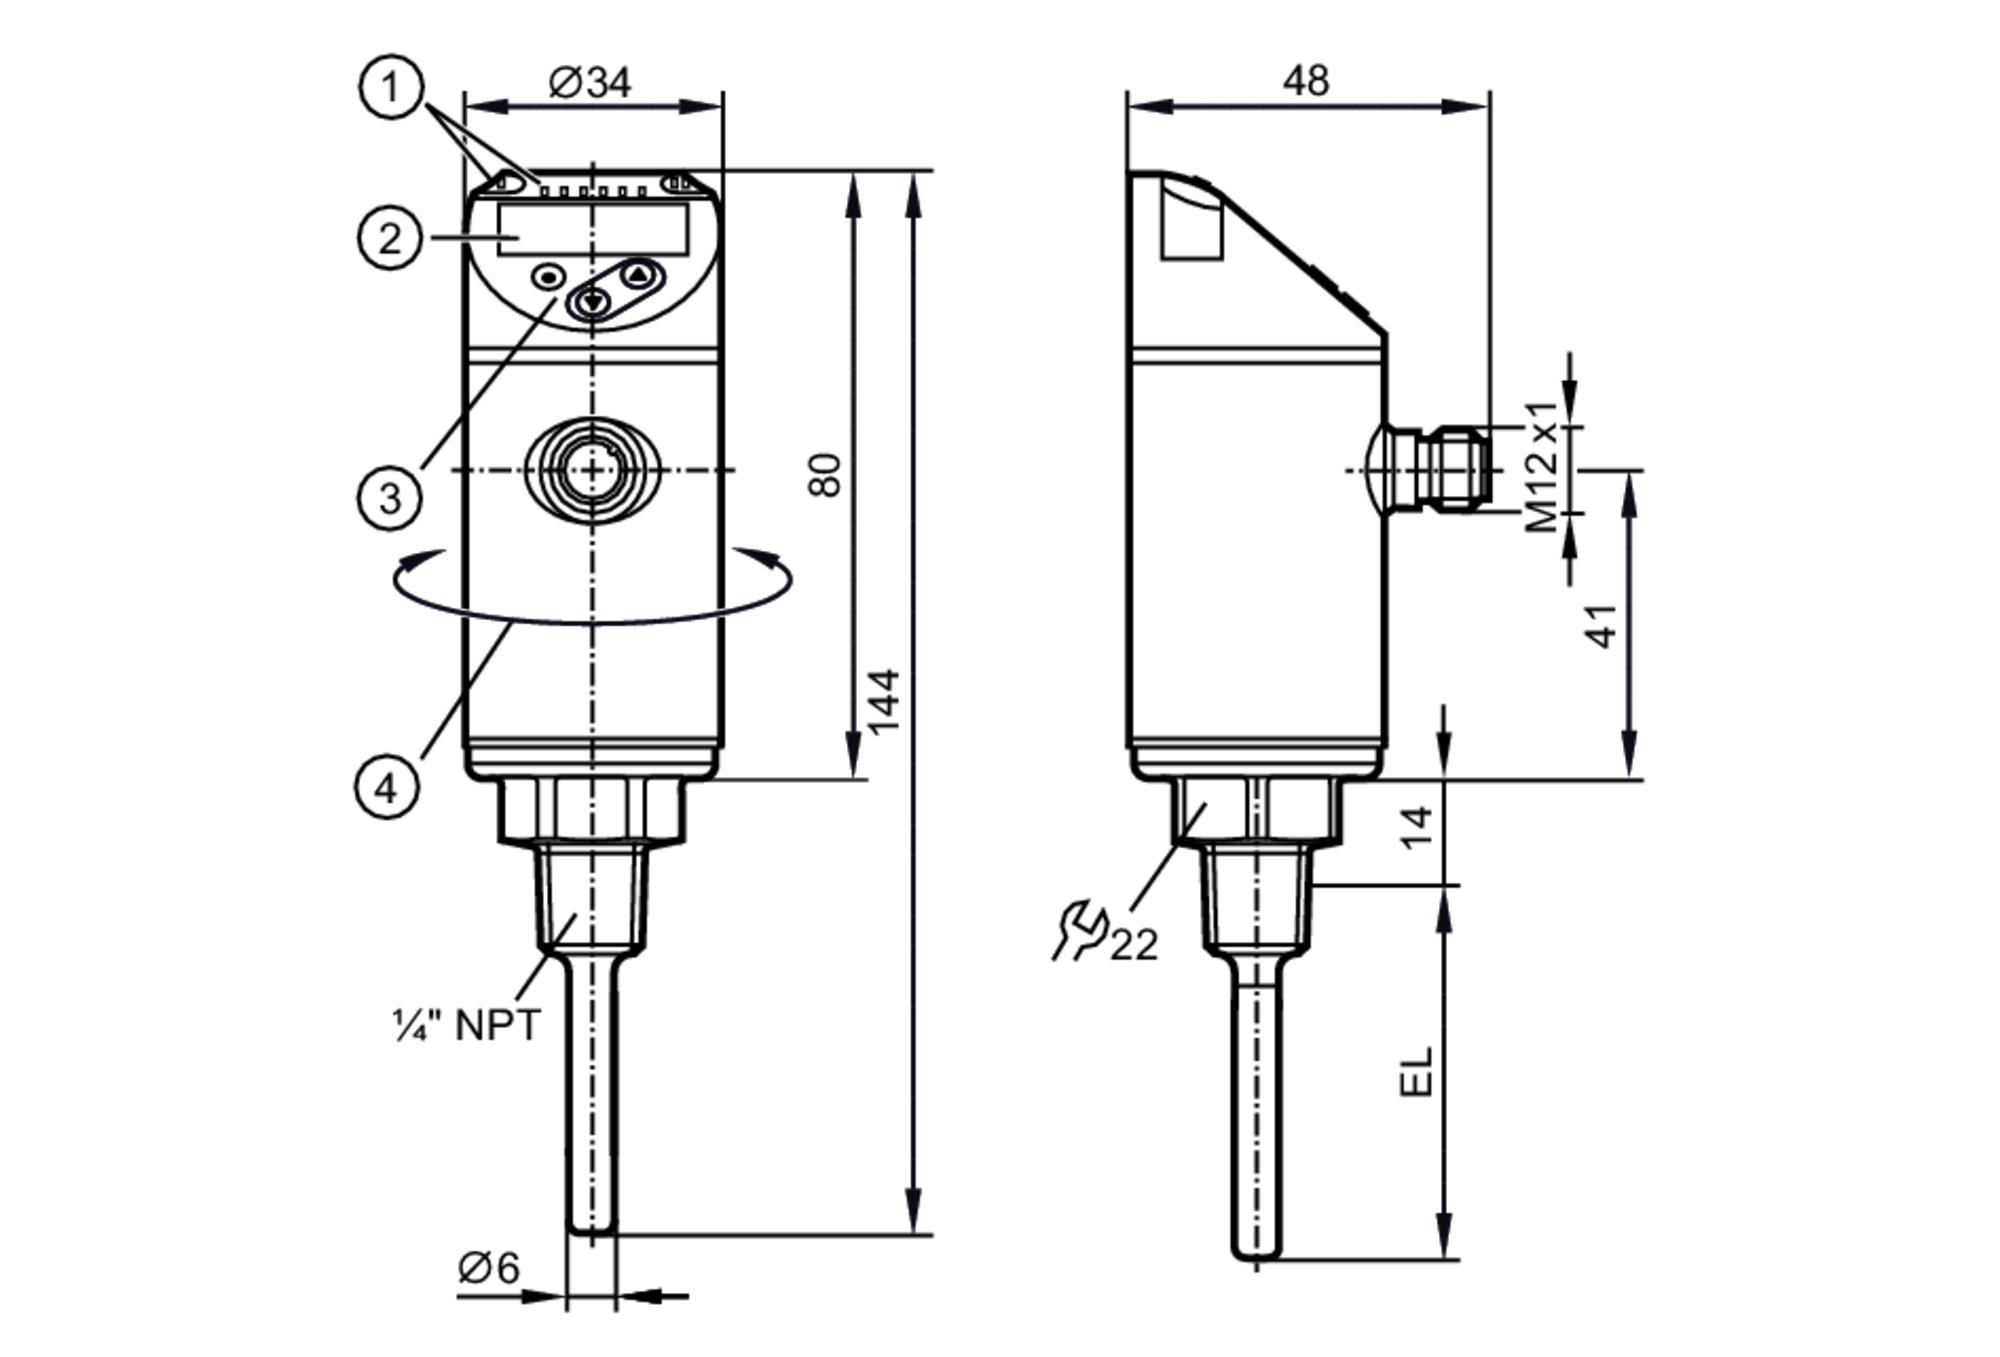 pbt gf30 wiring diagram